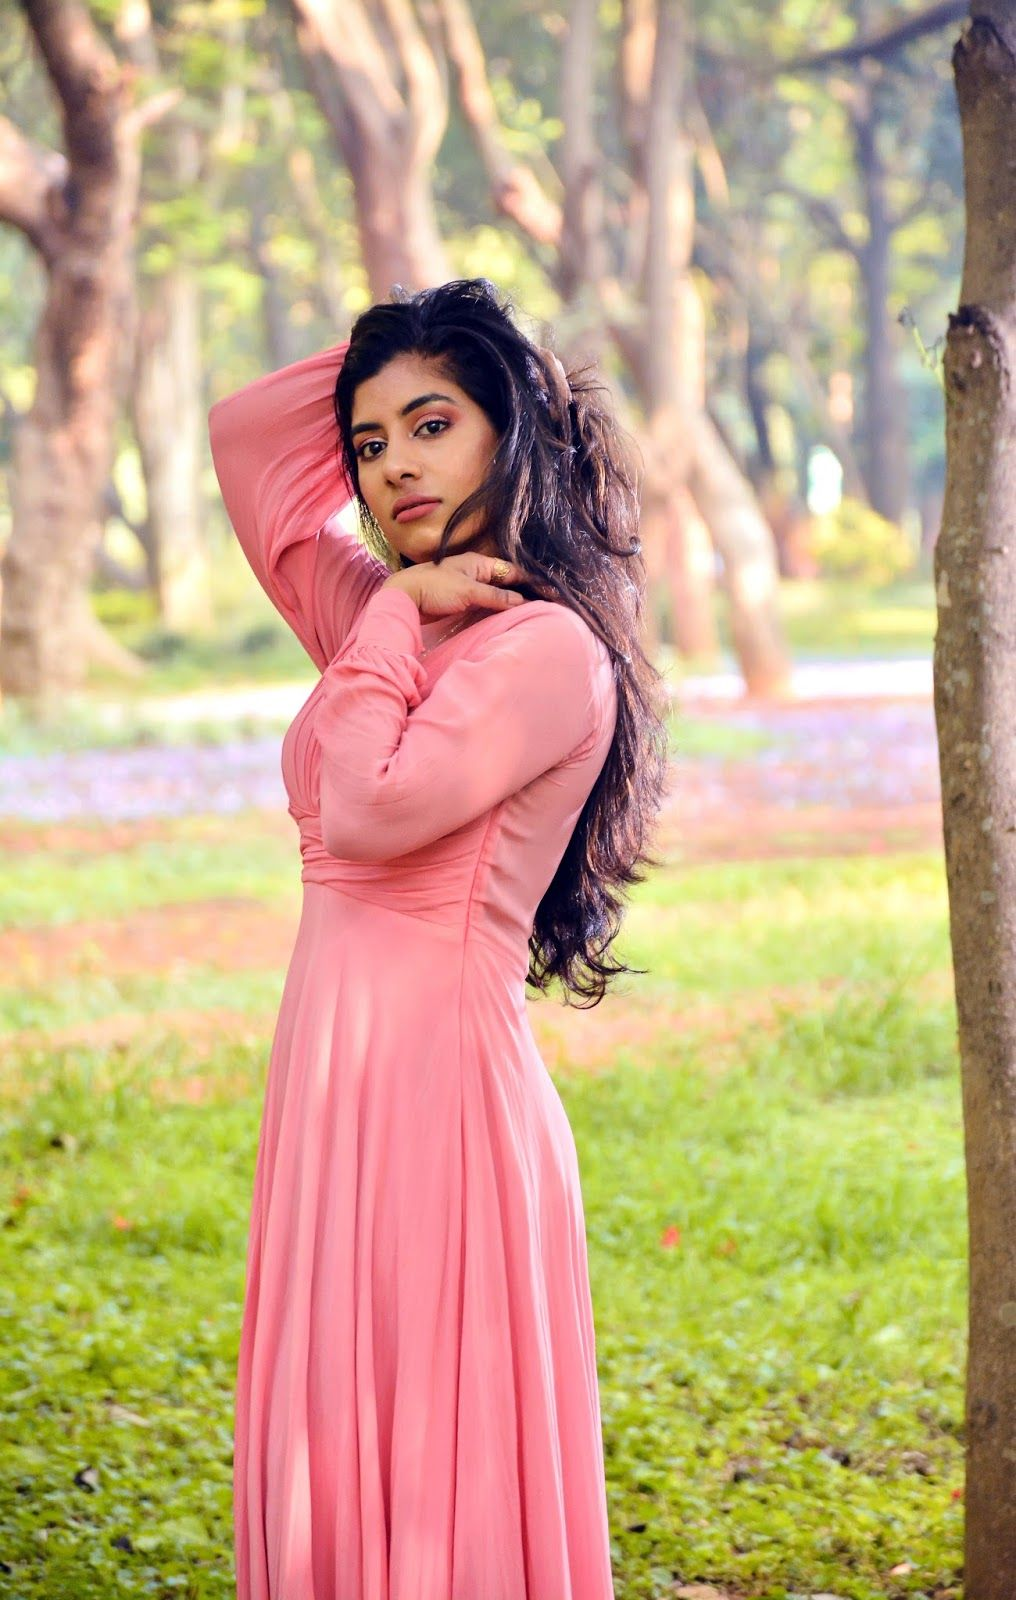 Pink Draped Elegant Gown